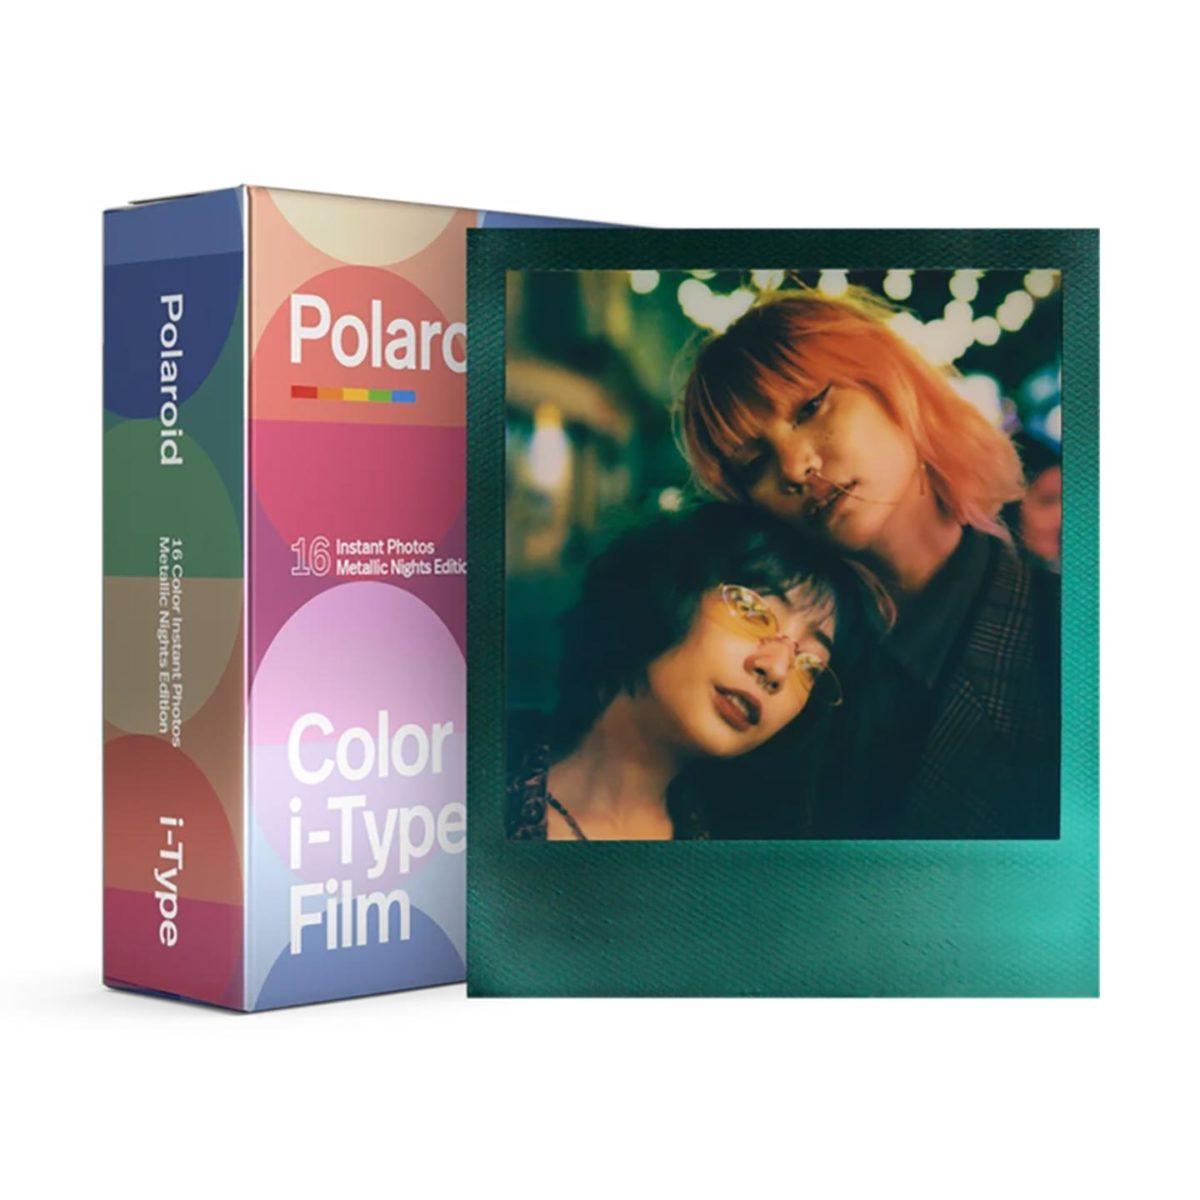 polaroid_i_type_color_film_metallic_nights_01